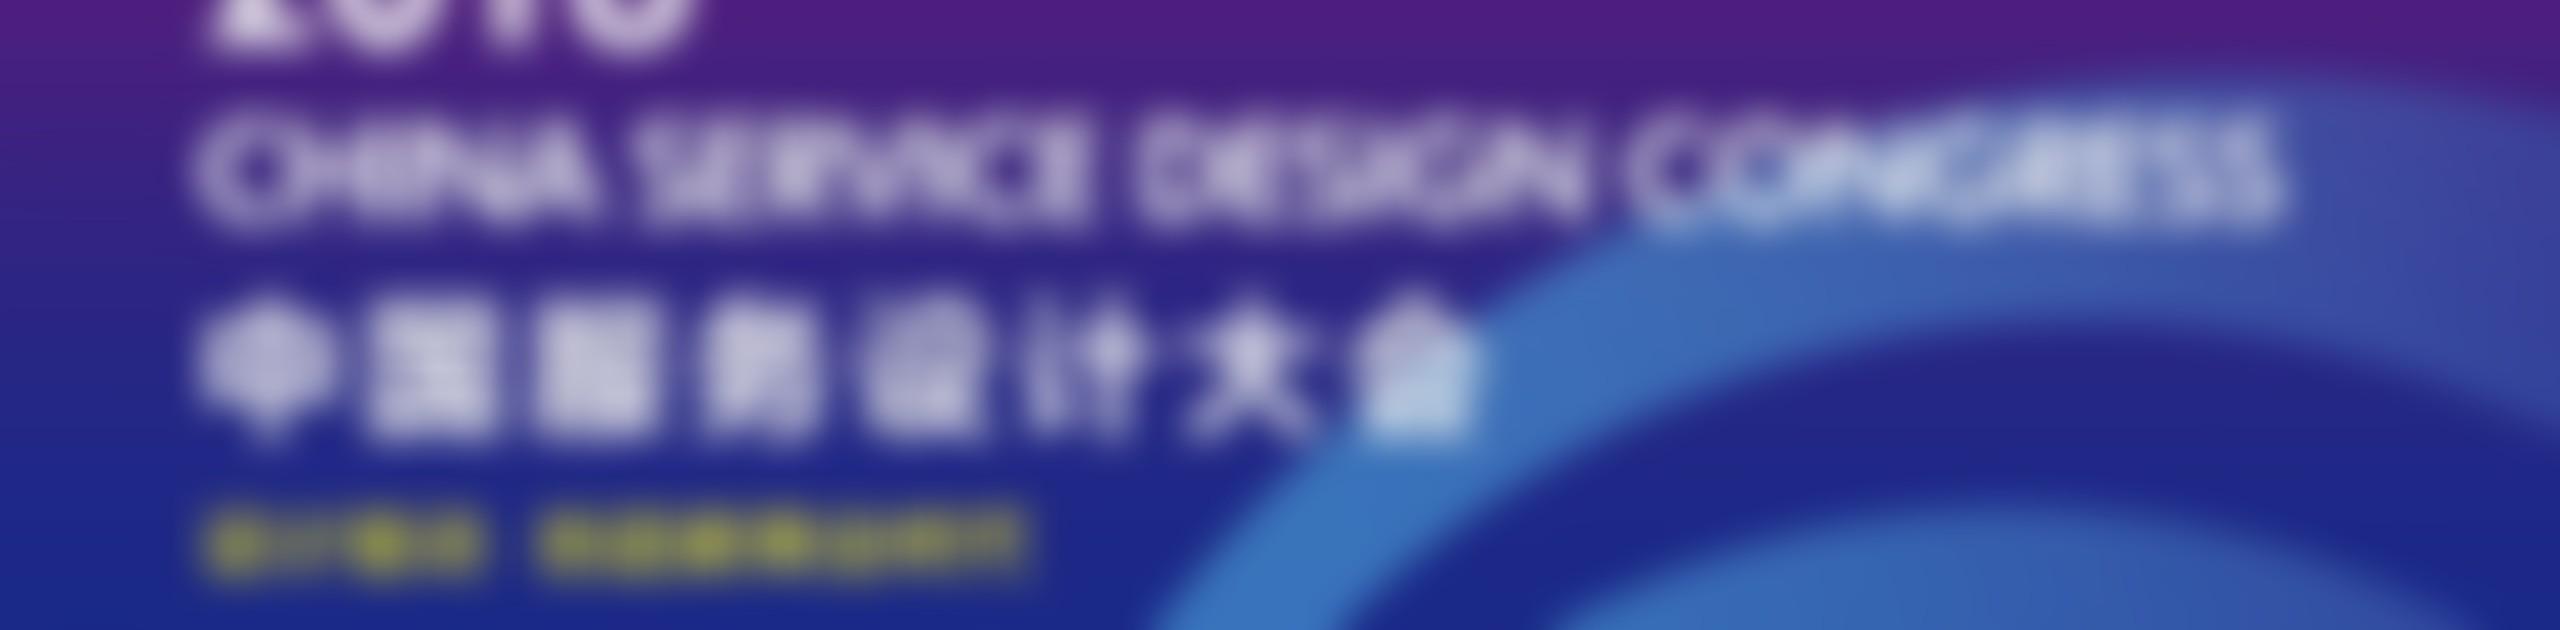 2018 China Service Design Congress